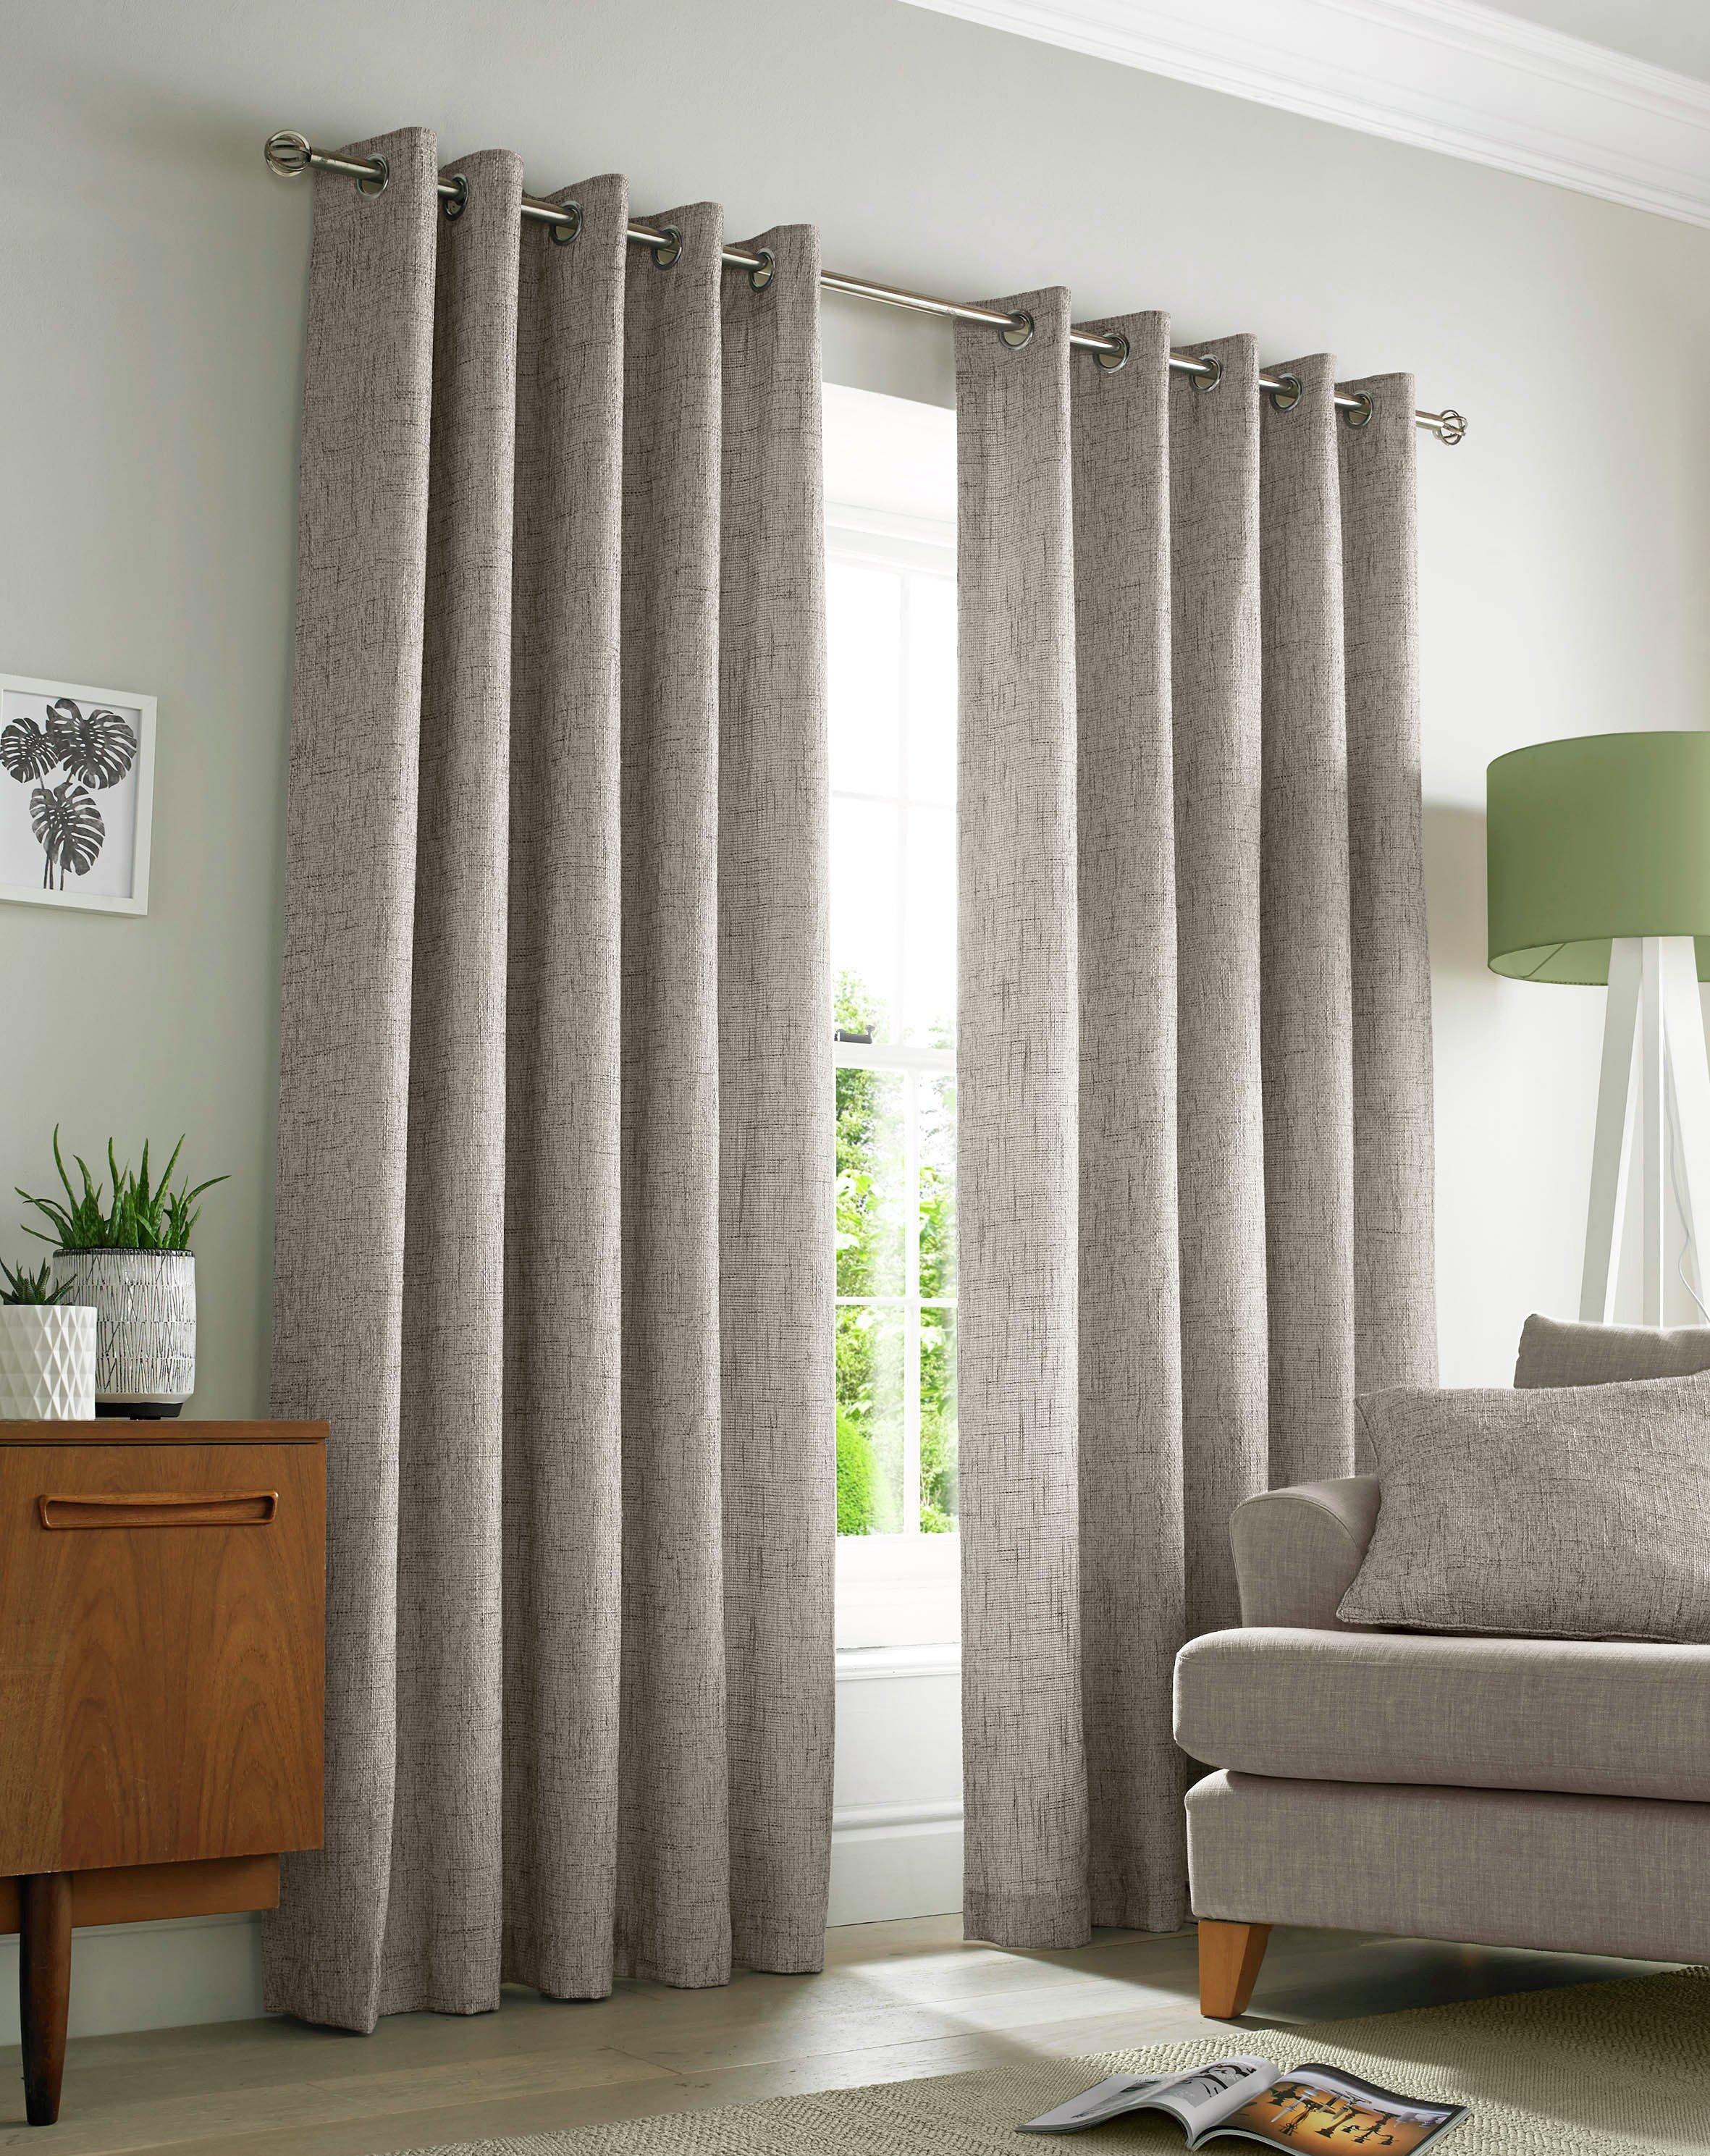 Academy Eyelet Curtains - 229x183cm - Natural.